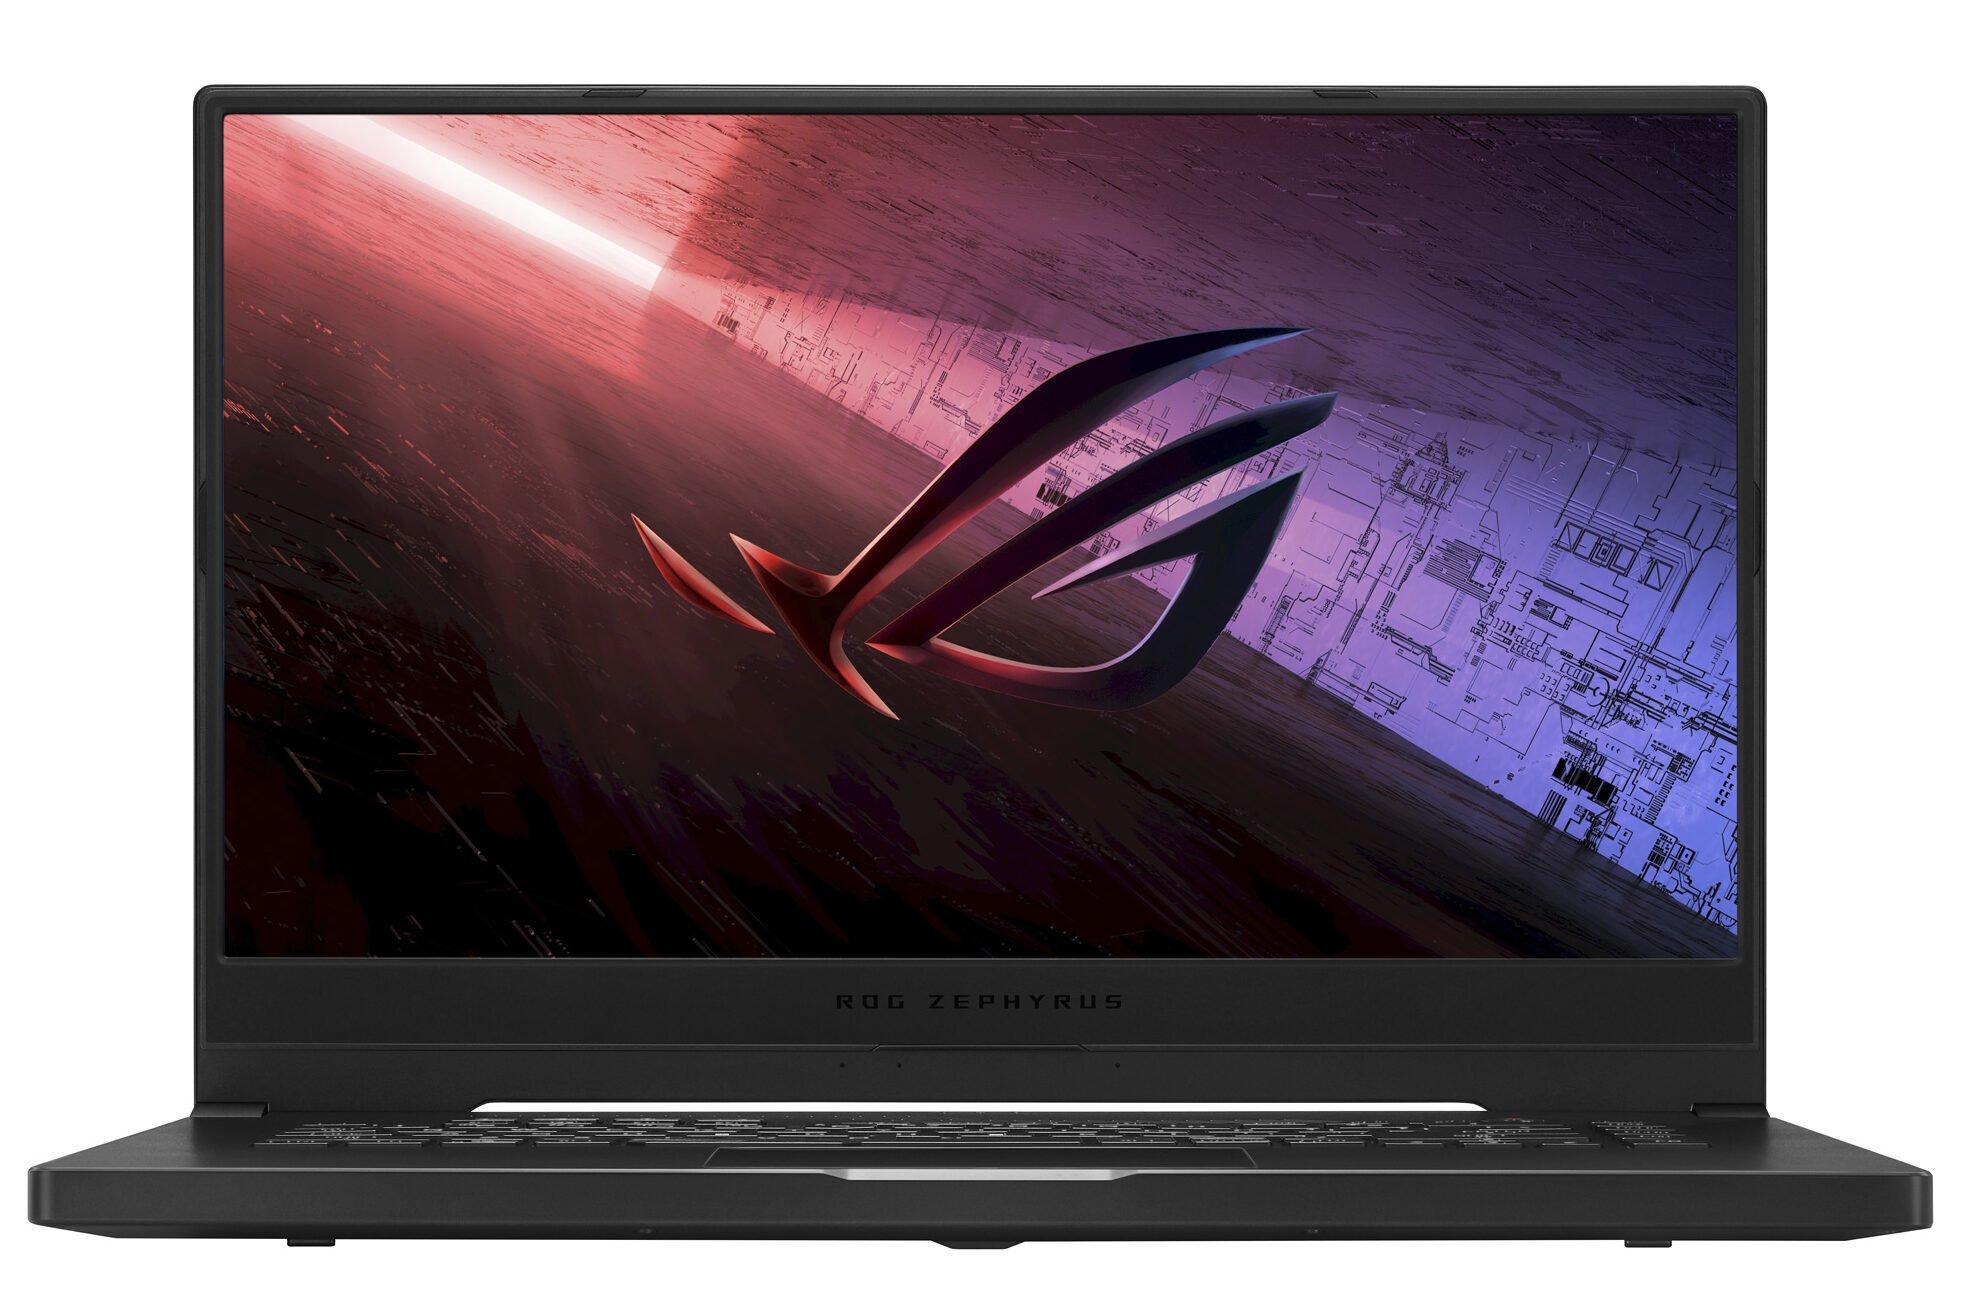 Asus ROG Zephyrus - Best Laptop for Animation